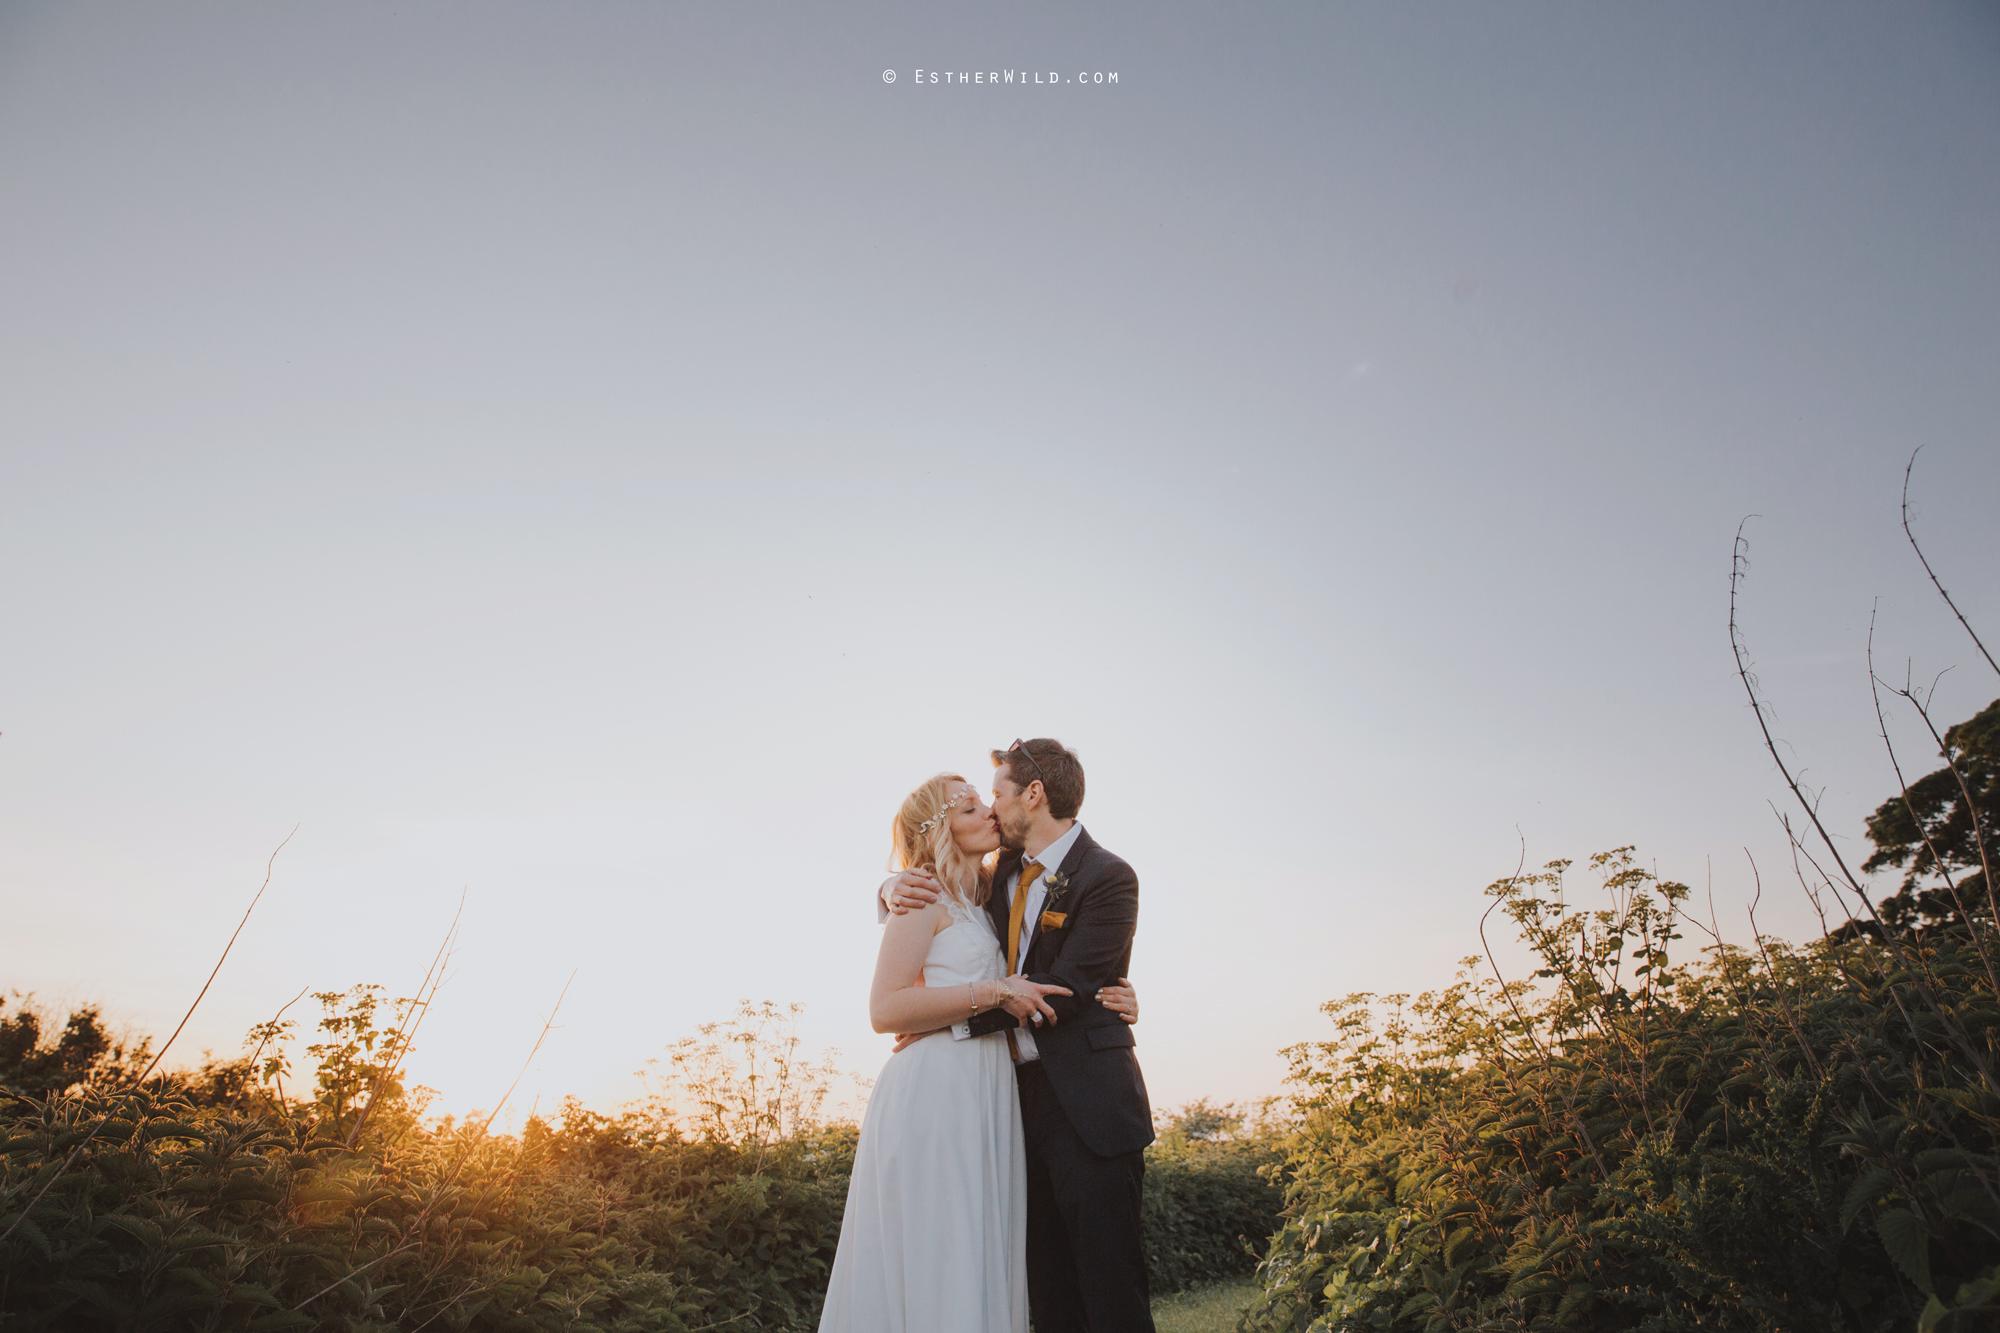 IMG_2771Cley_Barn_Drift_Norfolk_Coast_Wedding_Copyright_Esther_Wild_Photographer_.jpg